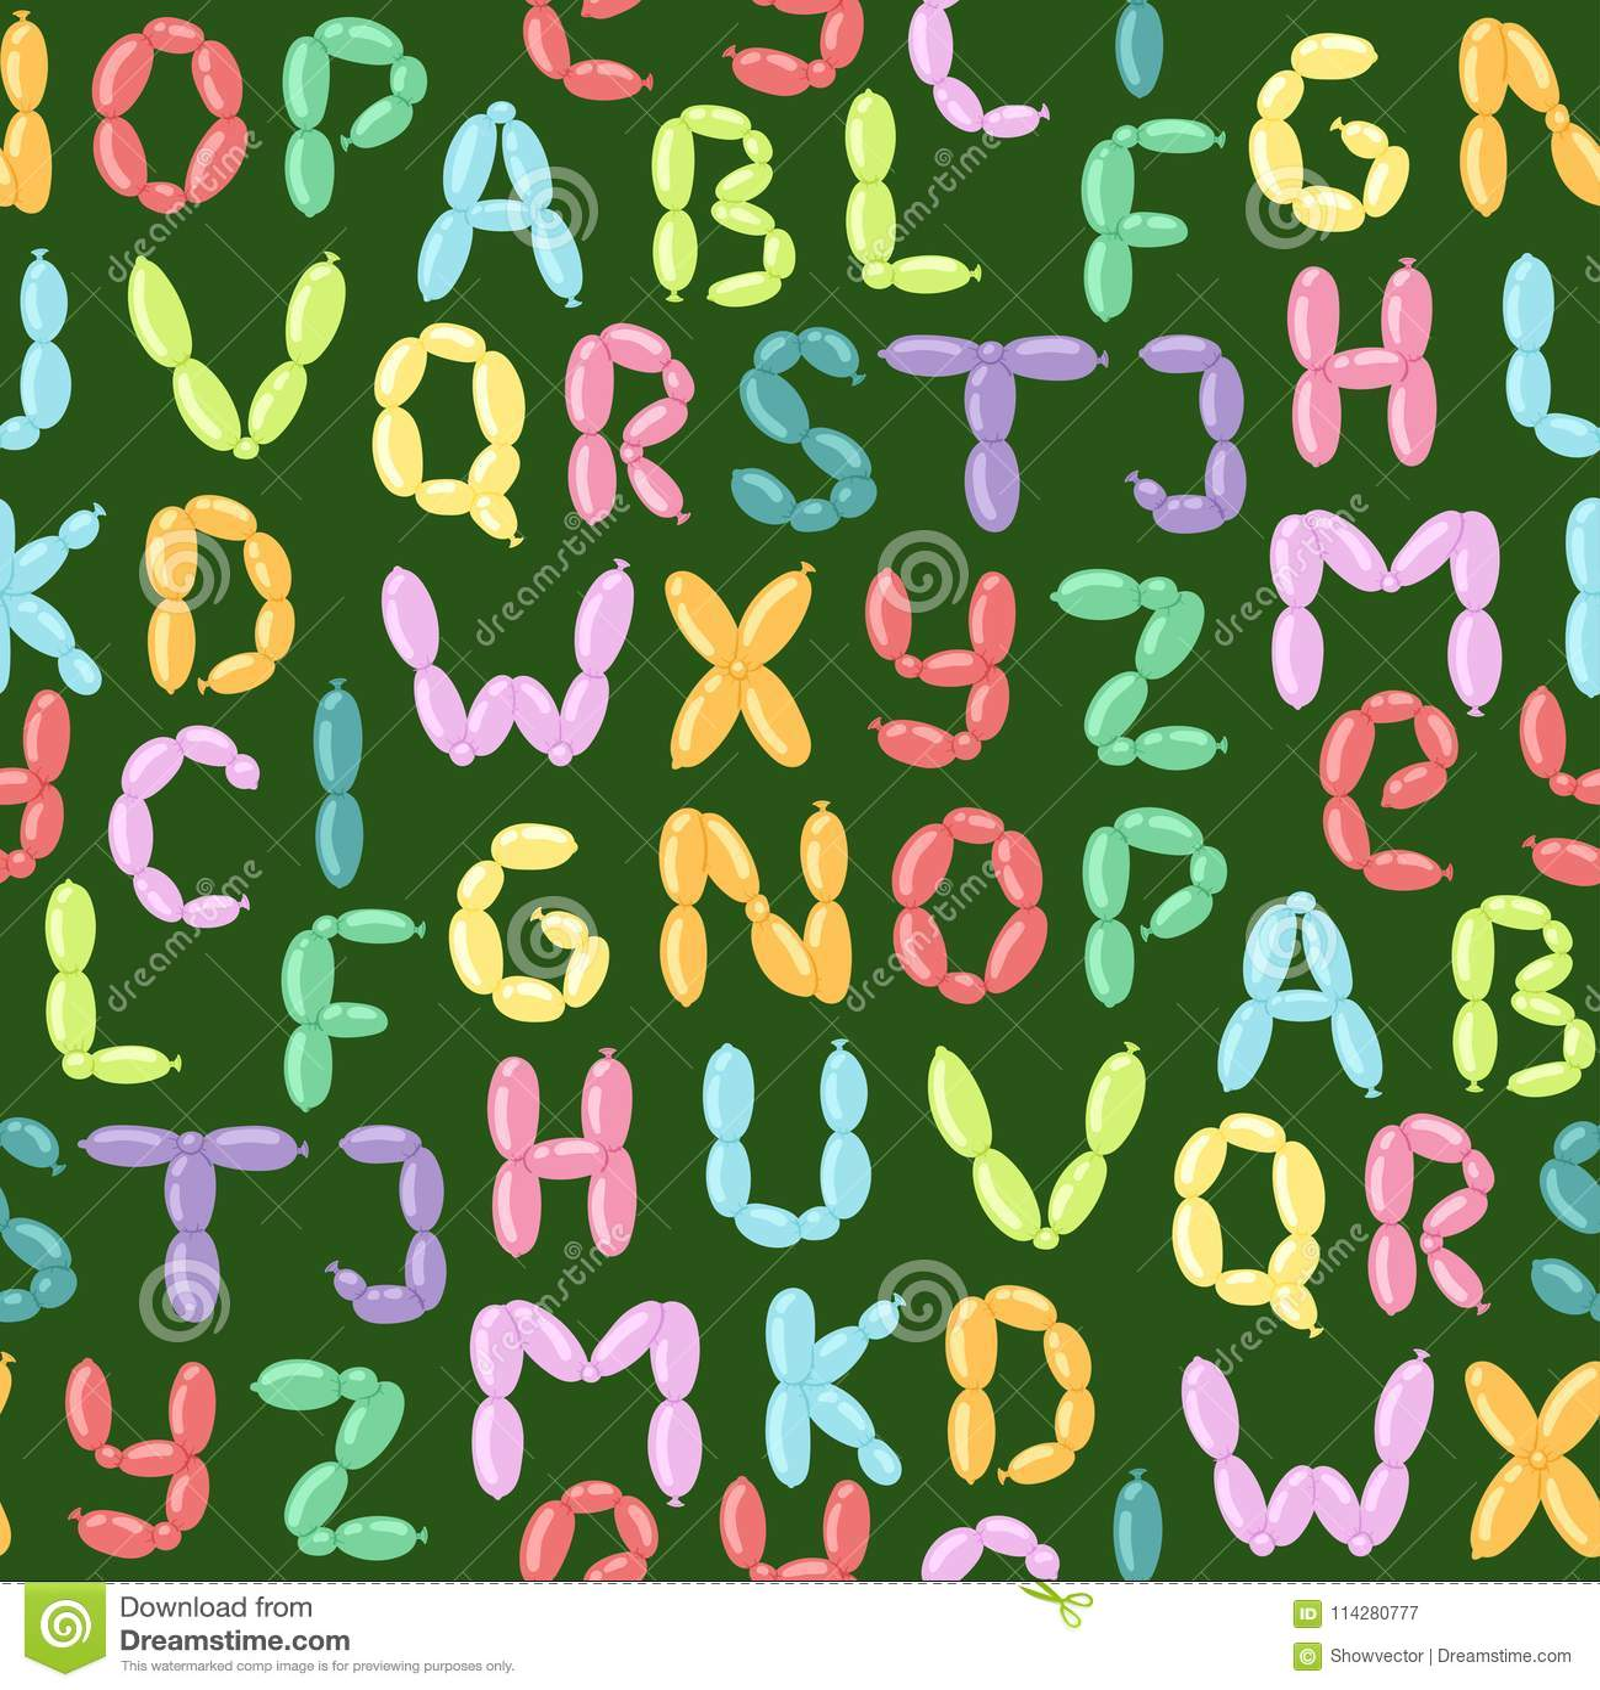 English balloon colorful alphabet vector holidays party abc and download english balloon colorful alphabet vector holidays party abc and education ozone type greeting helium cartoon m4hsunfo